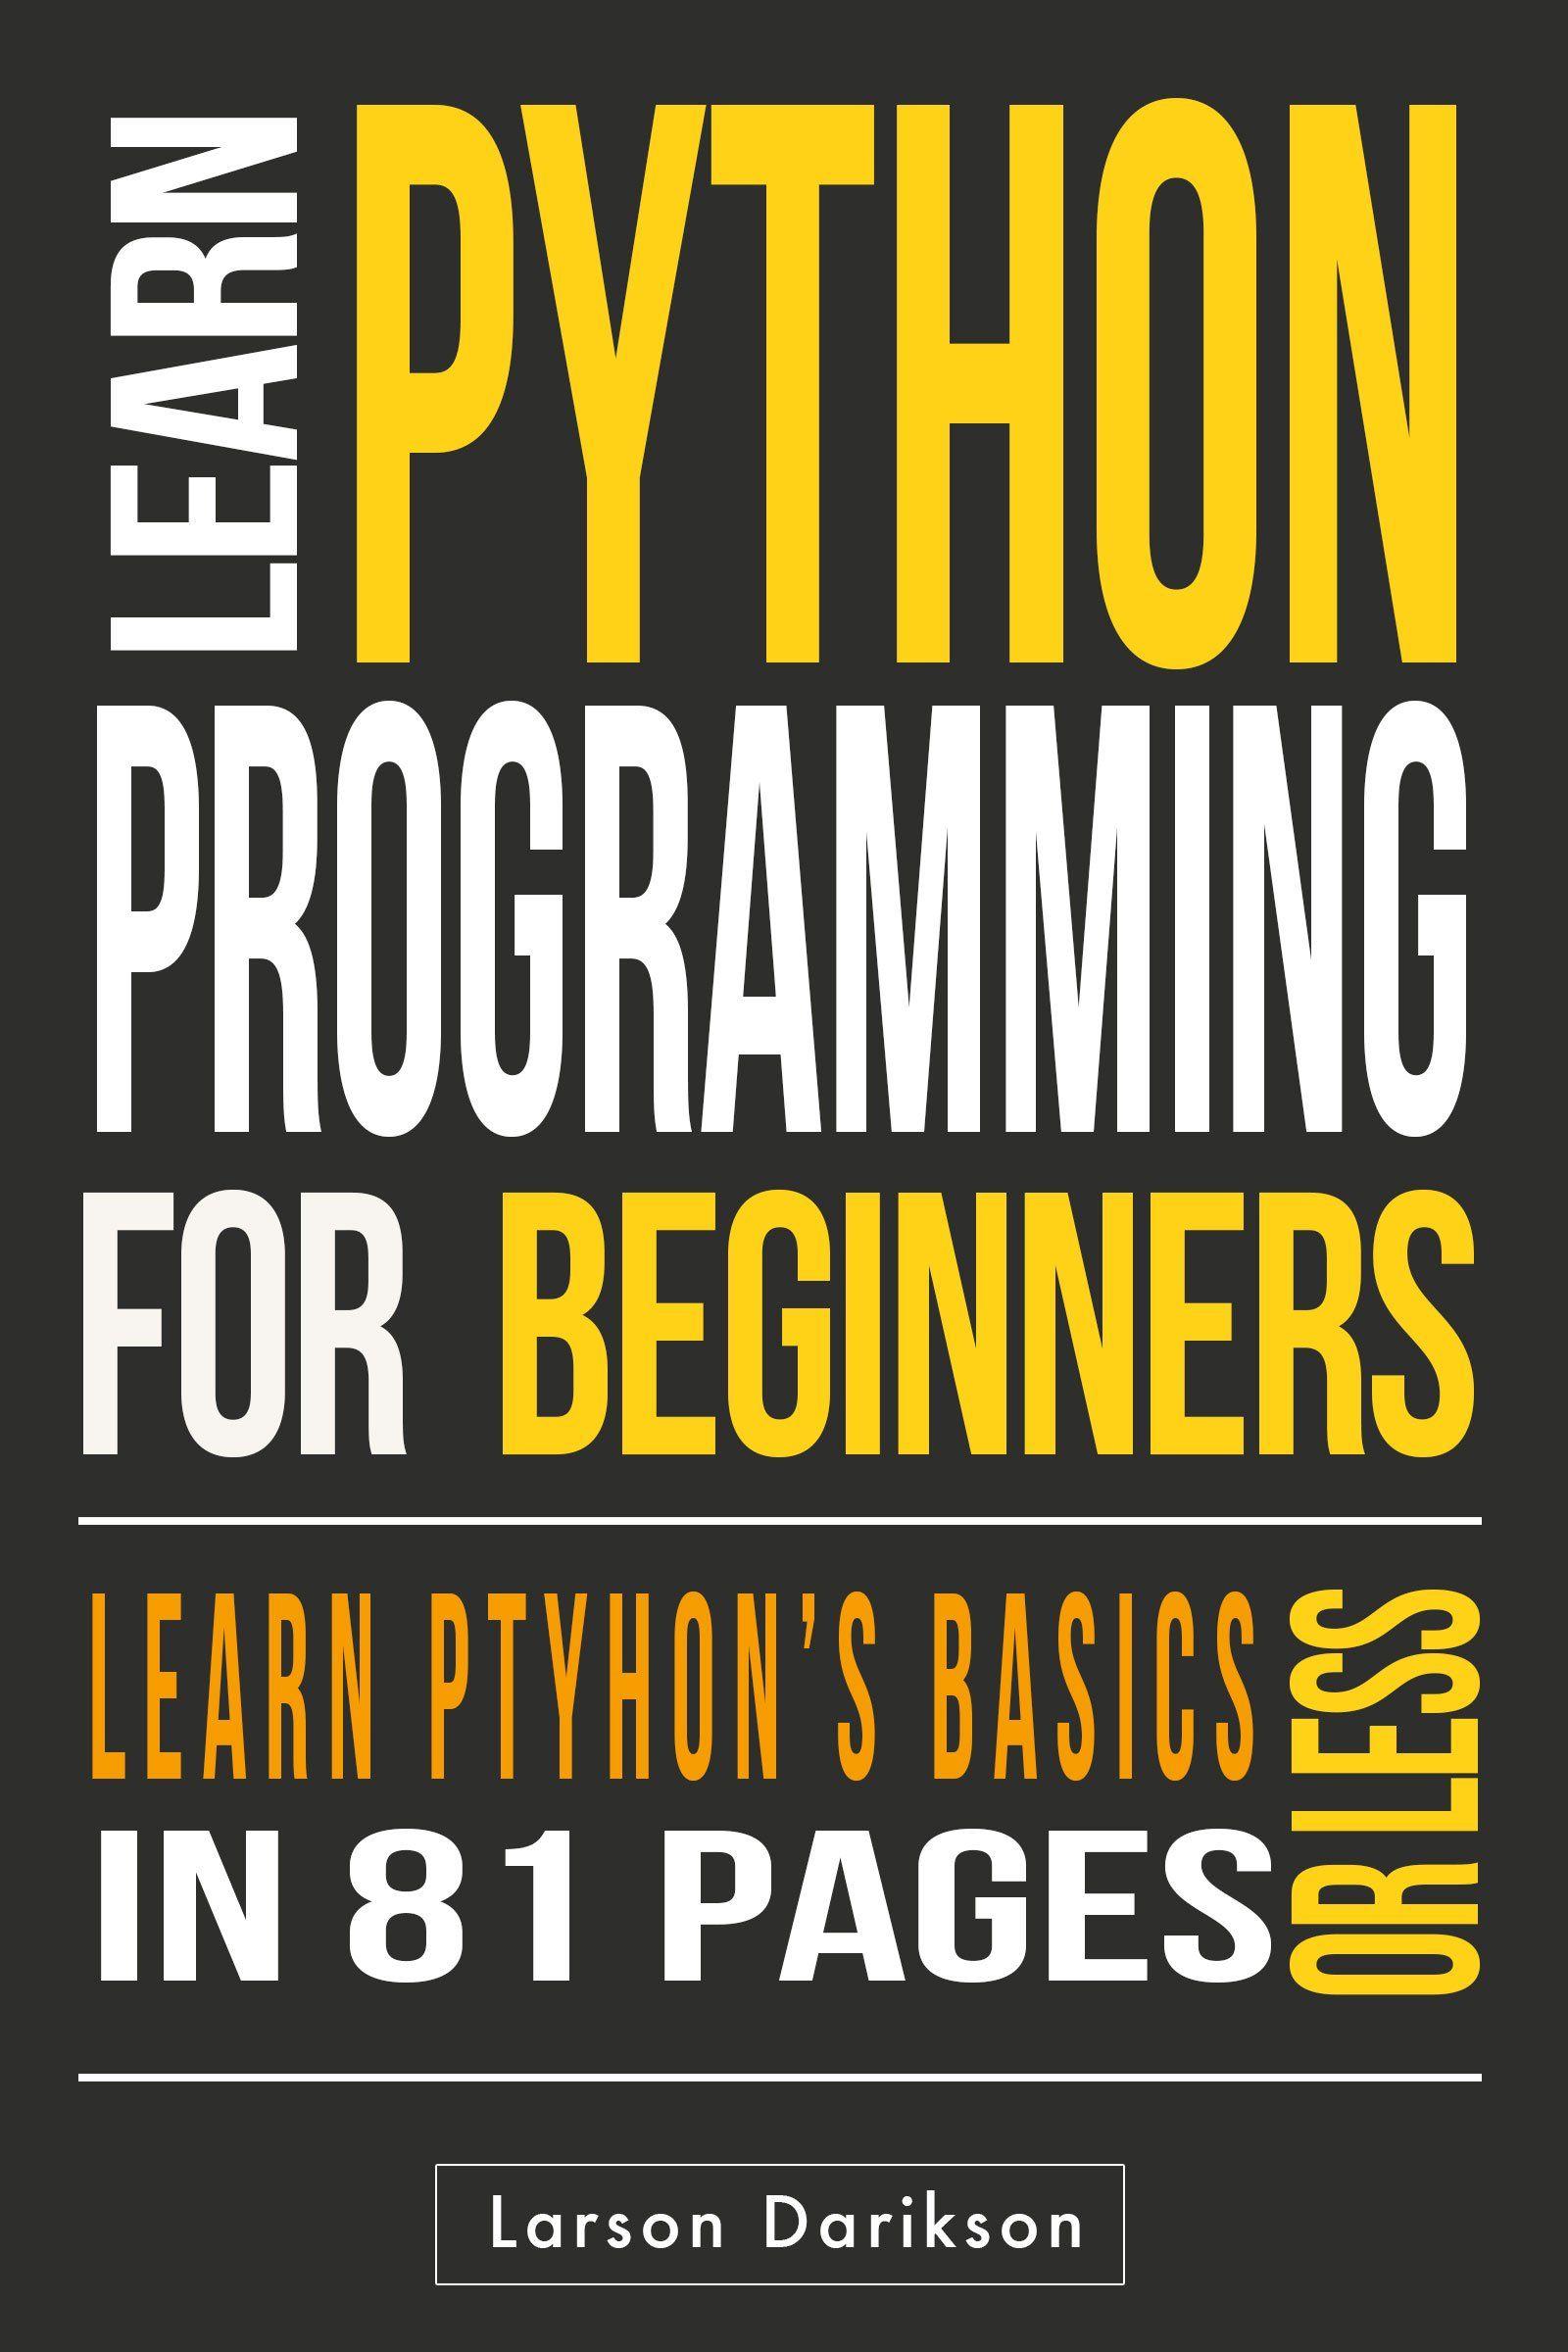 Invent with python bookshelf free python programming books invent with python bookshelf free python programming books 1betcityfo Choice Image